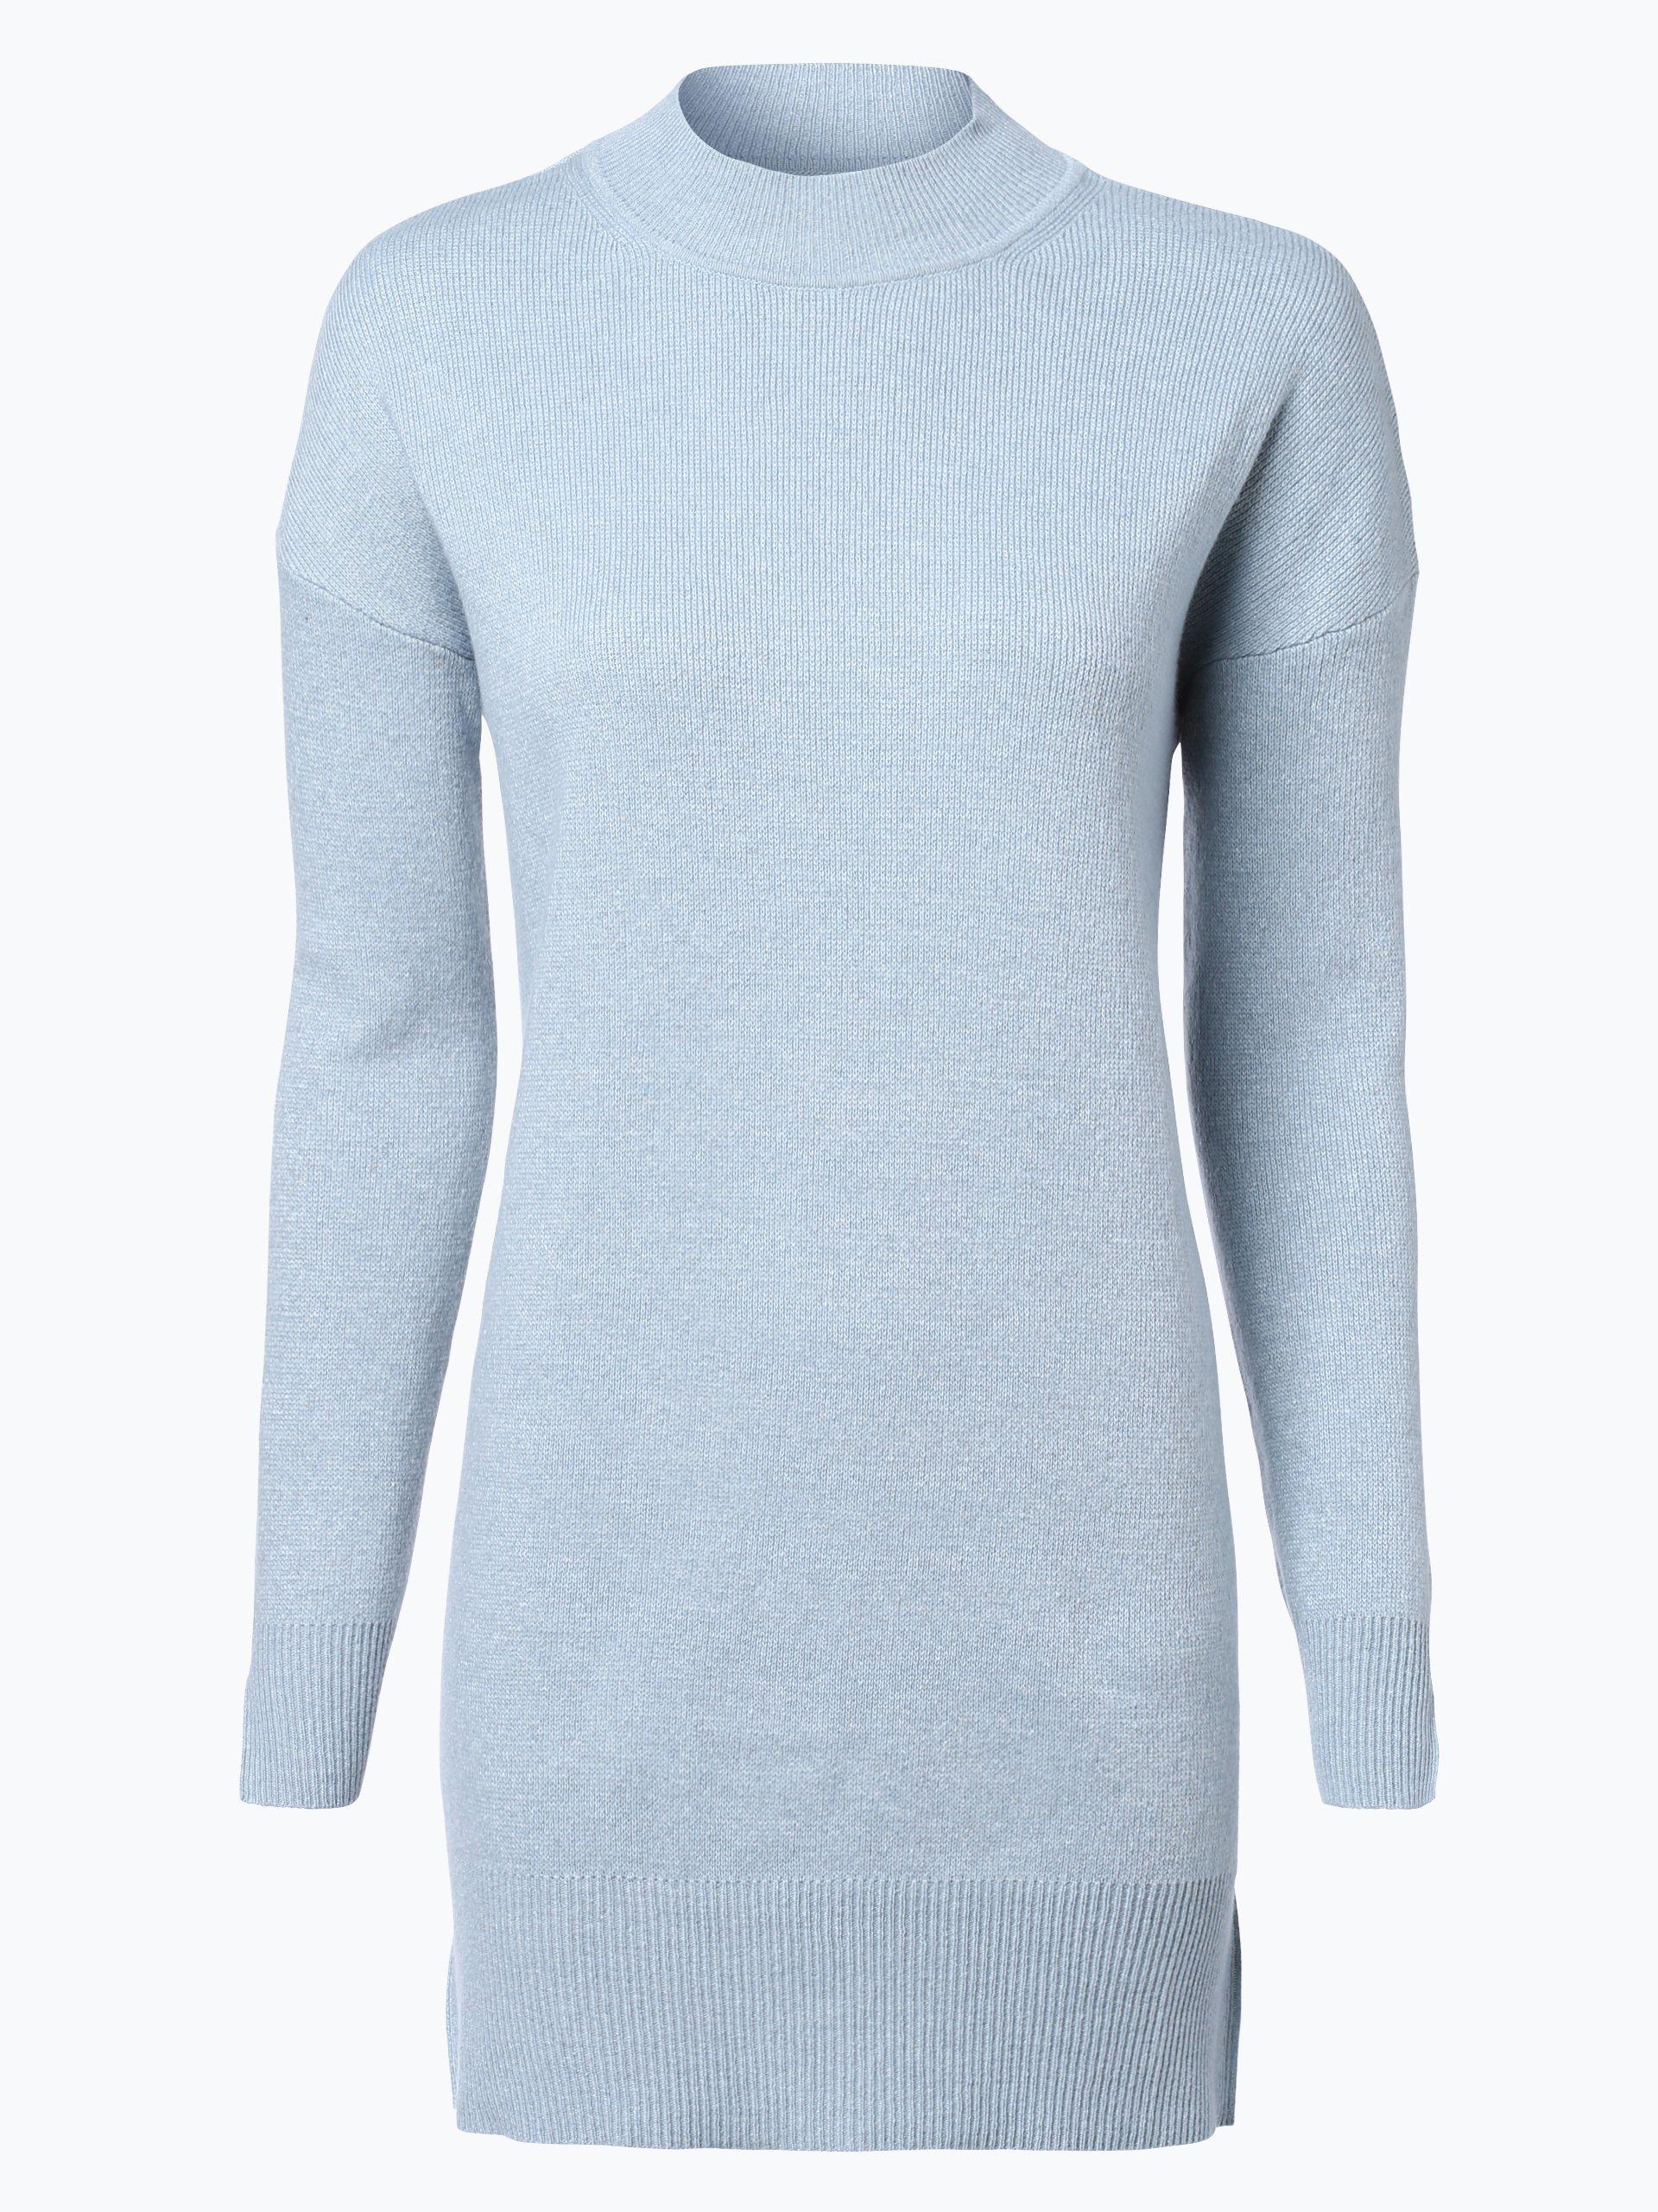 marc o 39 polo damen pullover mit cashmere anteil hellblau. Black Bedroom Furniture Sets. Home Design Ideas